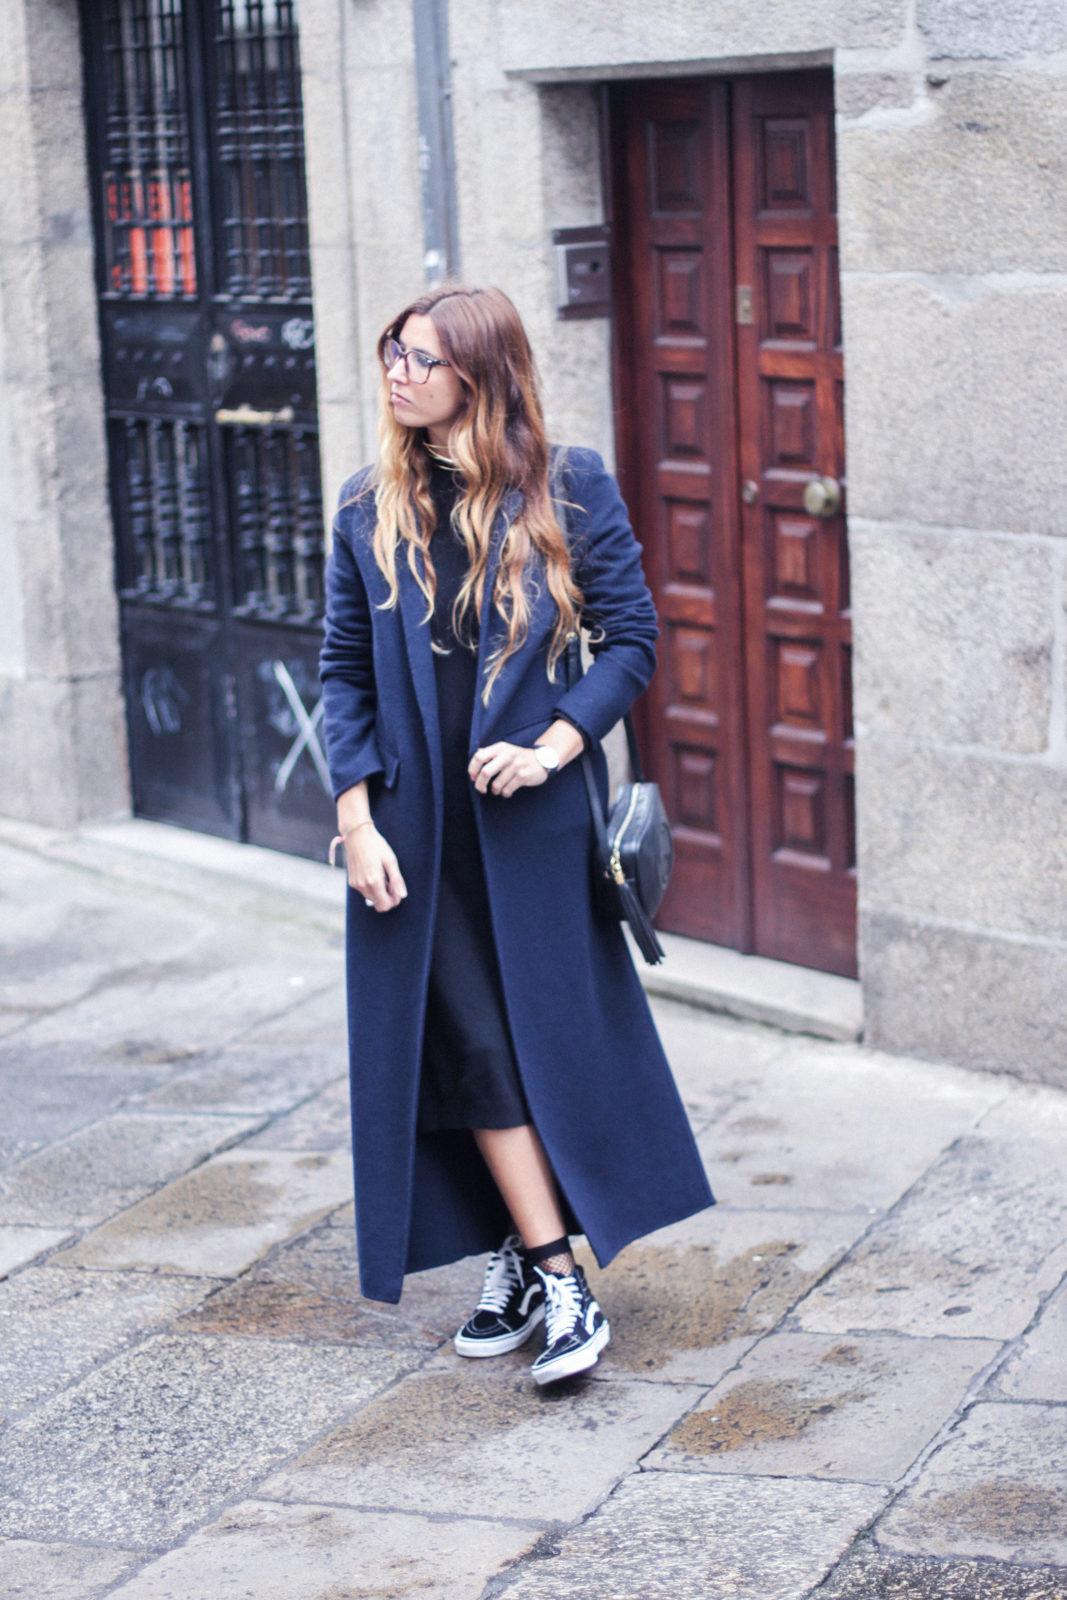 vestido_de_punto_midi_vans_calcetines_rejilla_choker_metalico_happiness_boutique_abrigo_largo_gucci_street_style_fall_2016_donkeycool-29